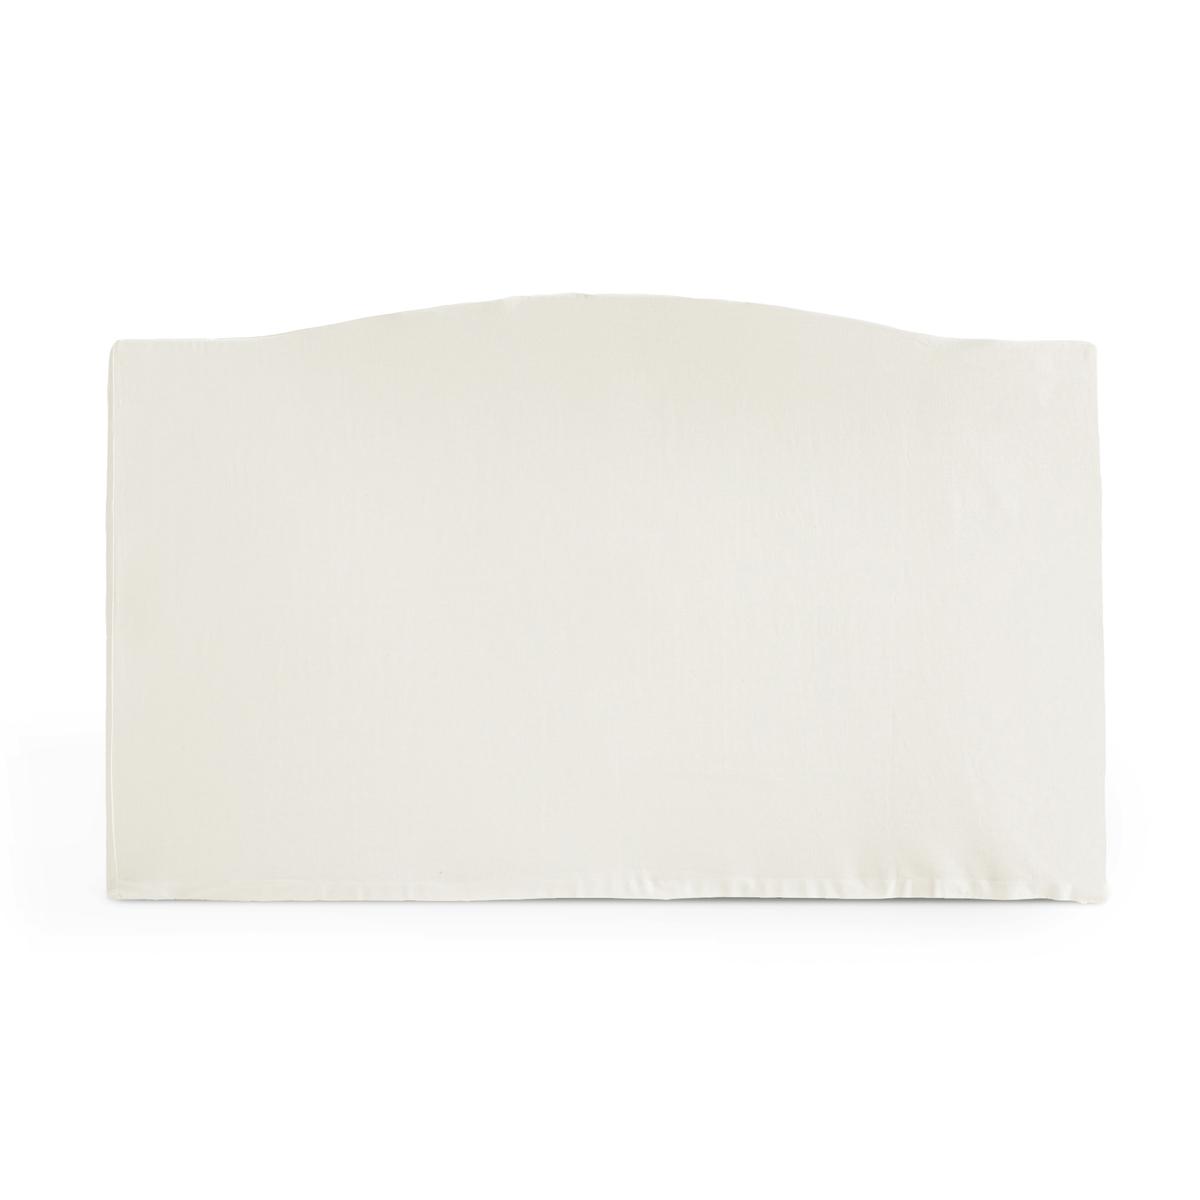 Чехол La Redoute Для кроватного изголовья Louis XV из хлопка Scenario 90 x 85 см белый подушка для изголовья кровати 100% хлопокscenario